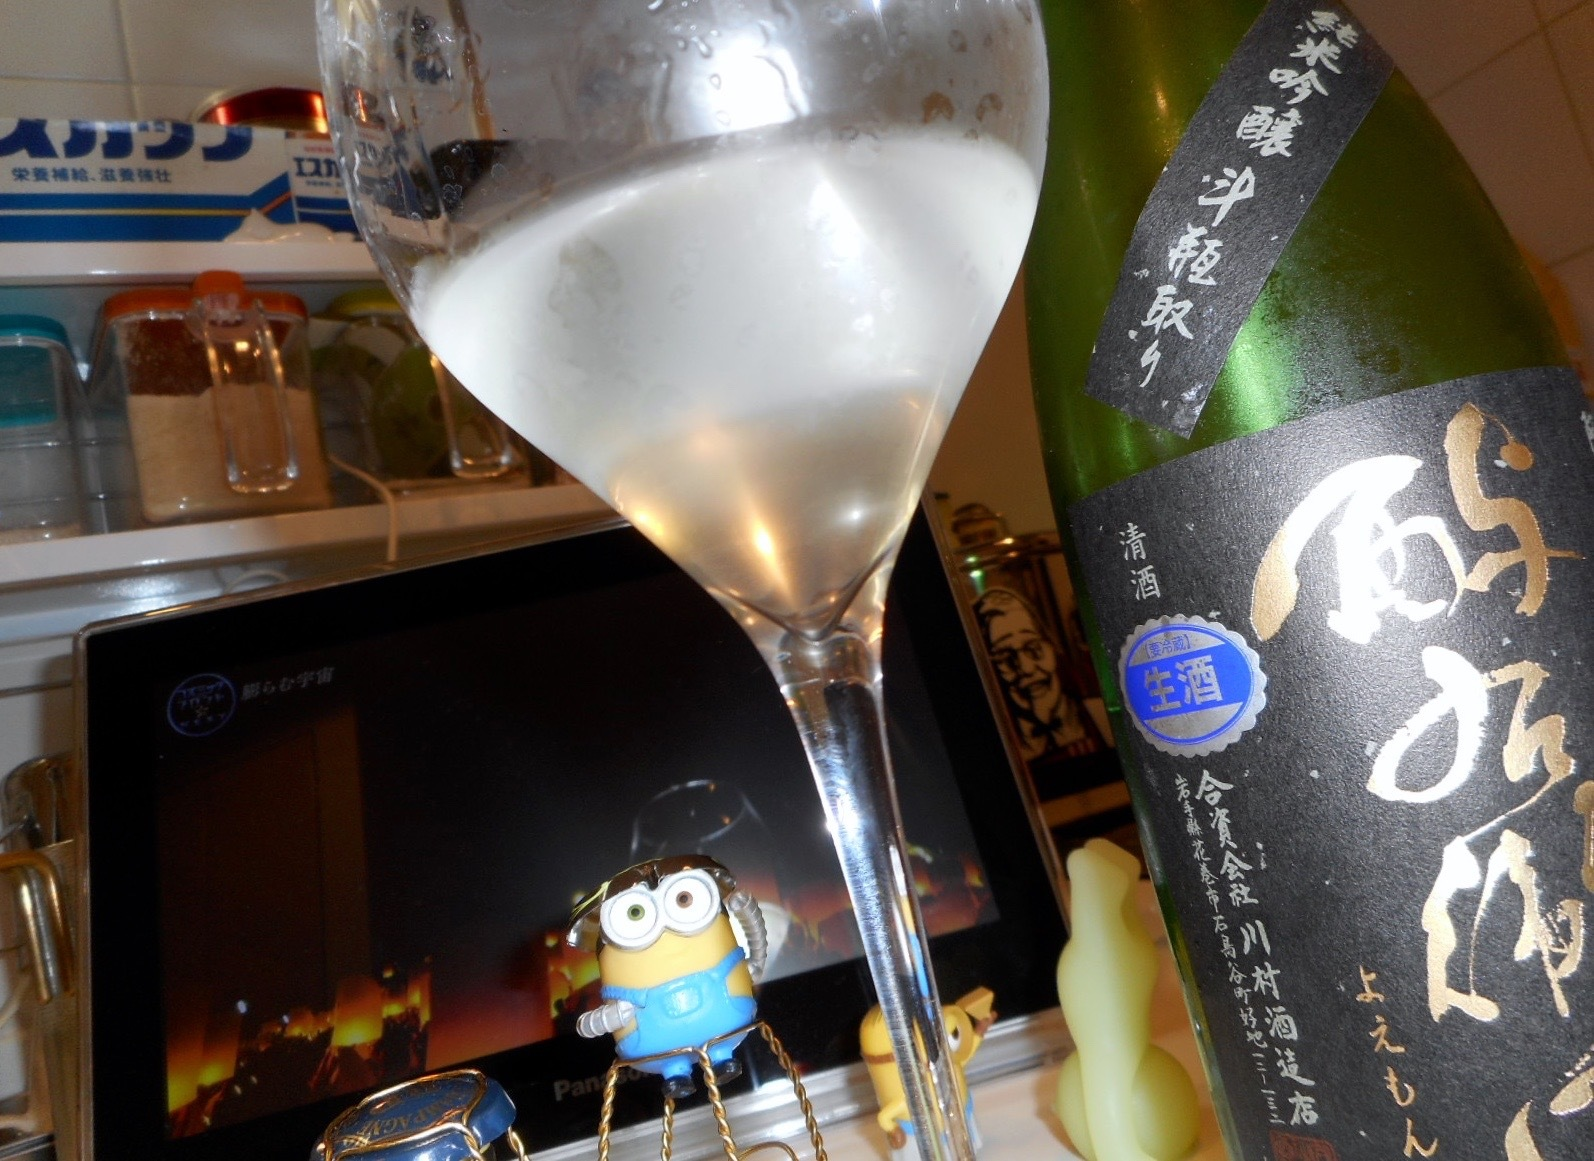 yoemon_yamada50tobin28by10.jpg